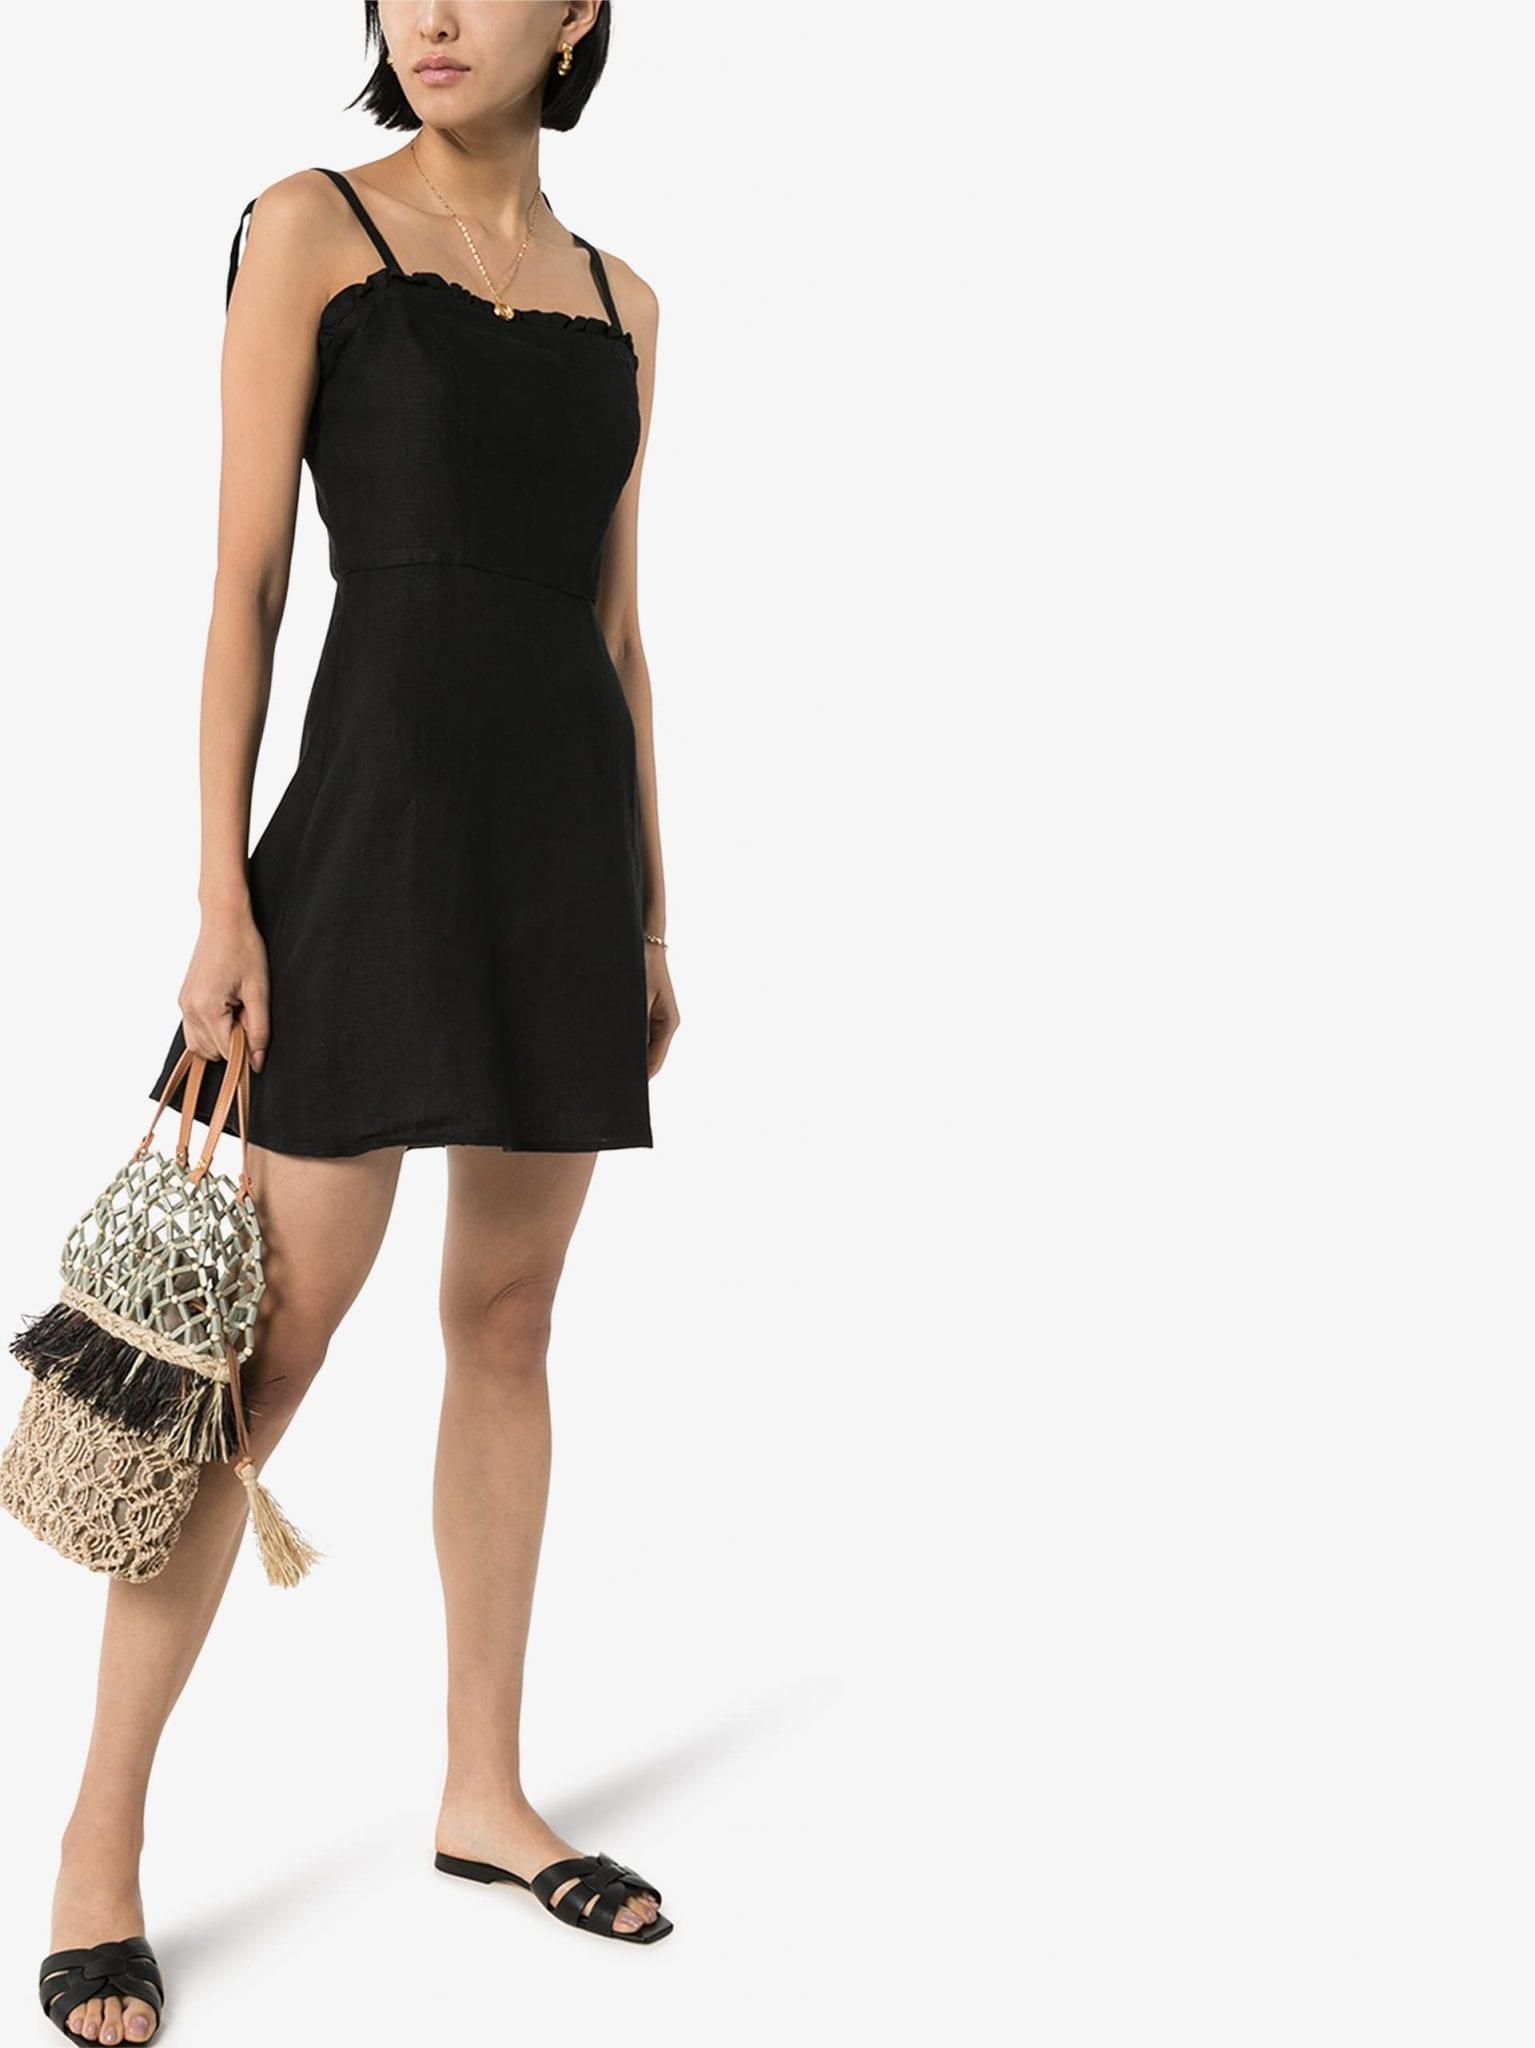 HONORINE Poppy Mini Dress